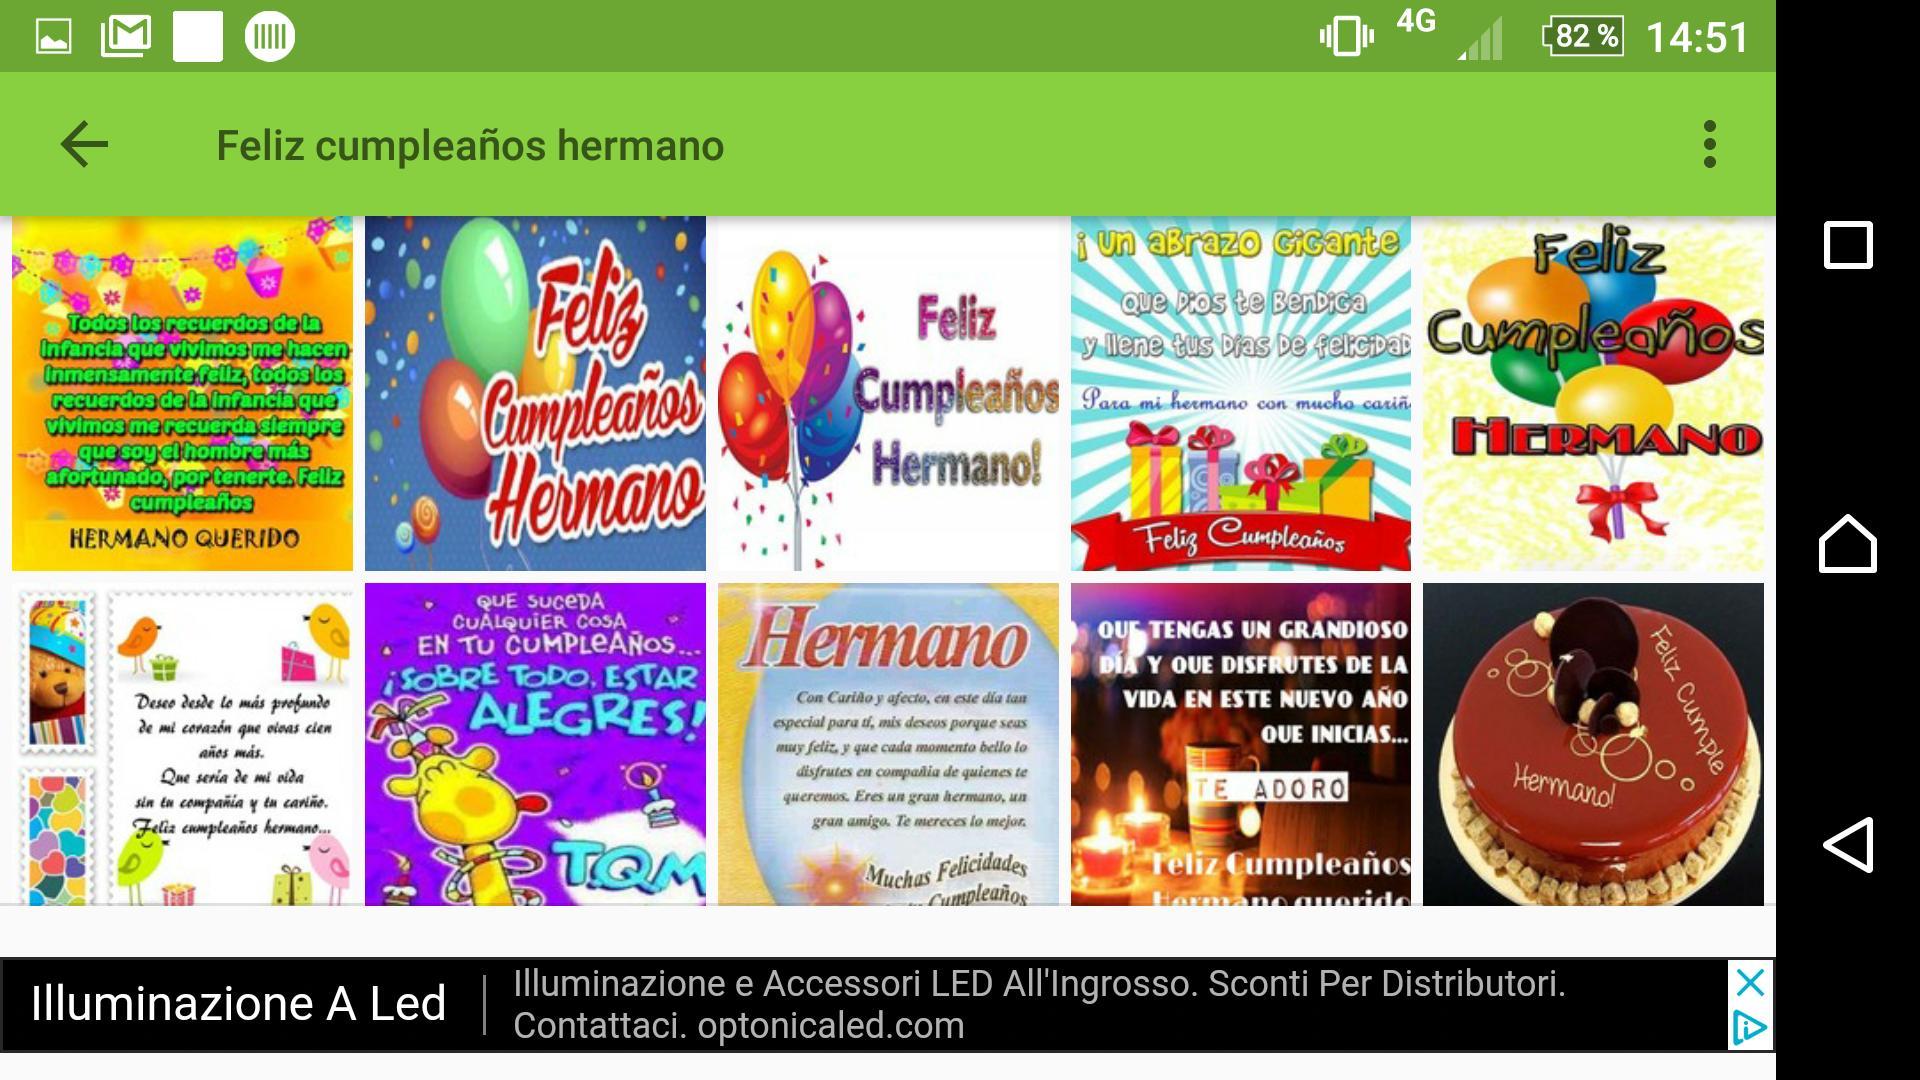 Feliz Cumpleaños Hermano Frases E Imágenes для андроид